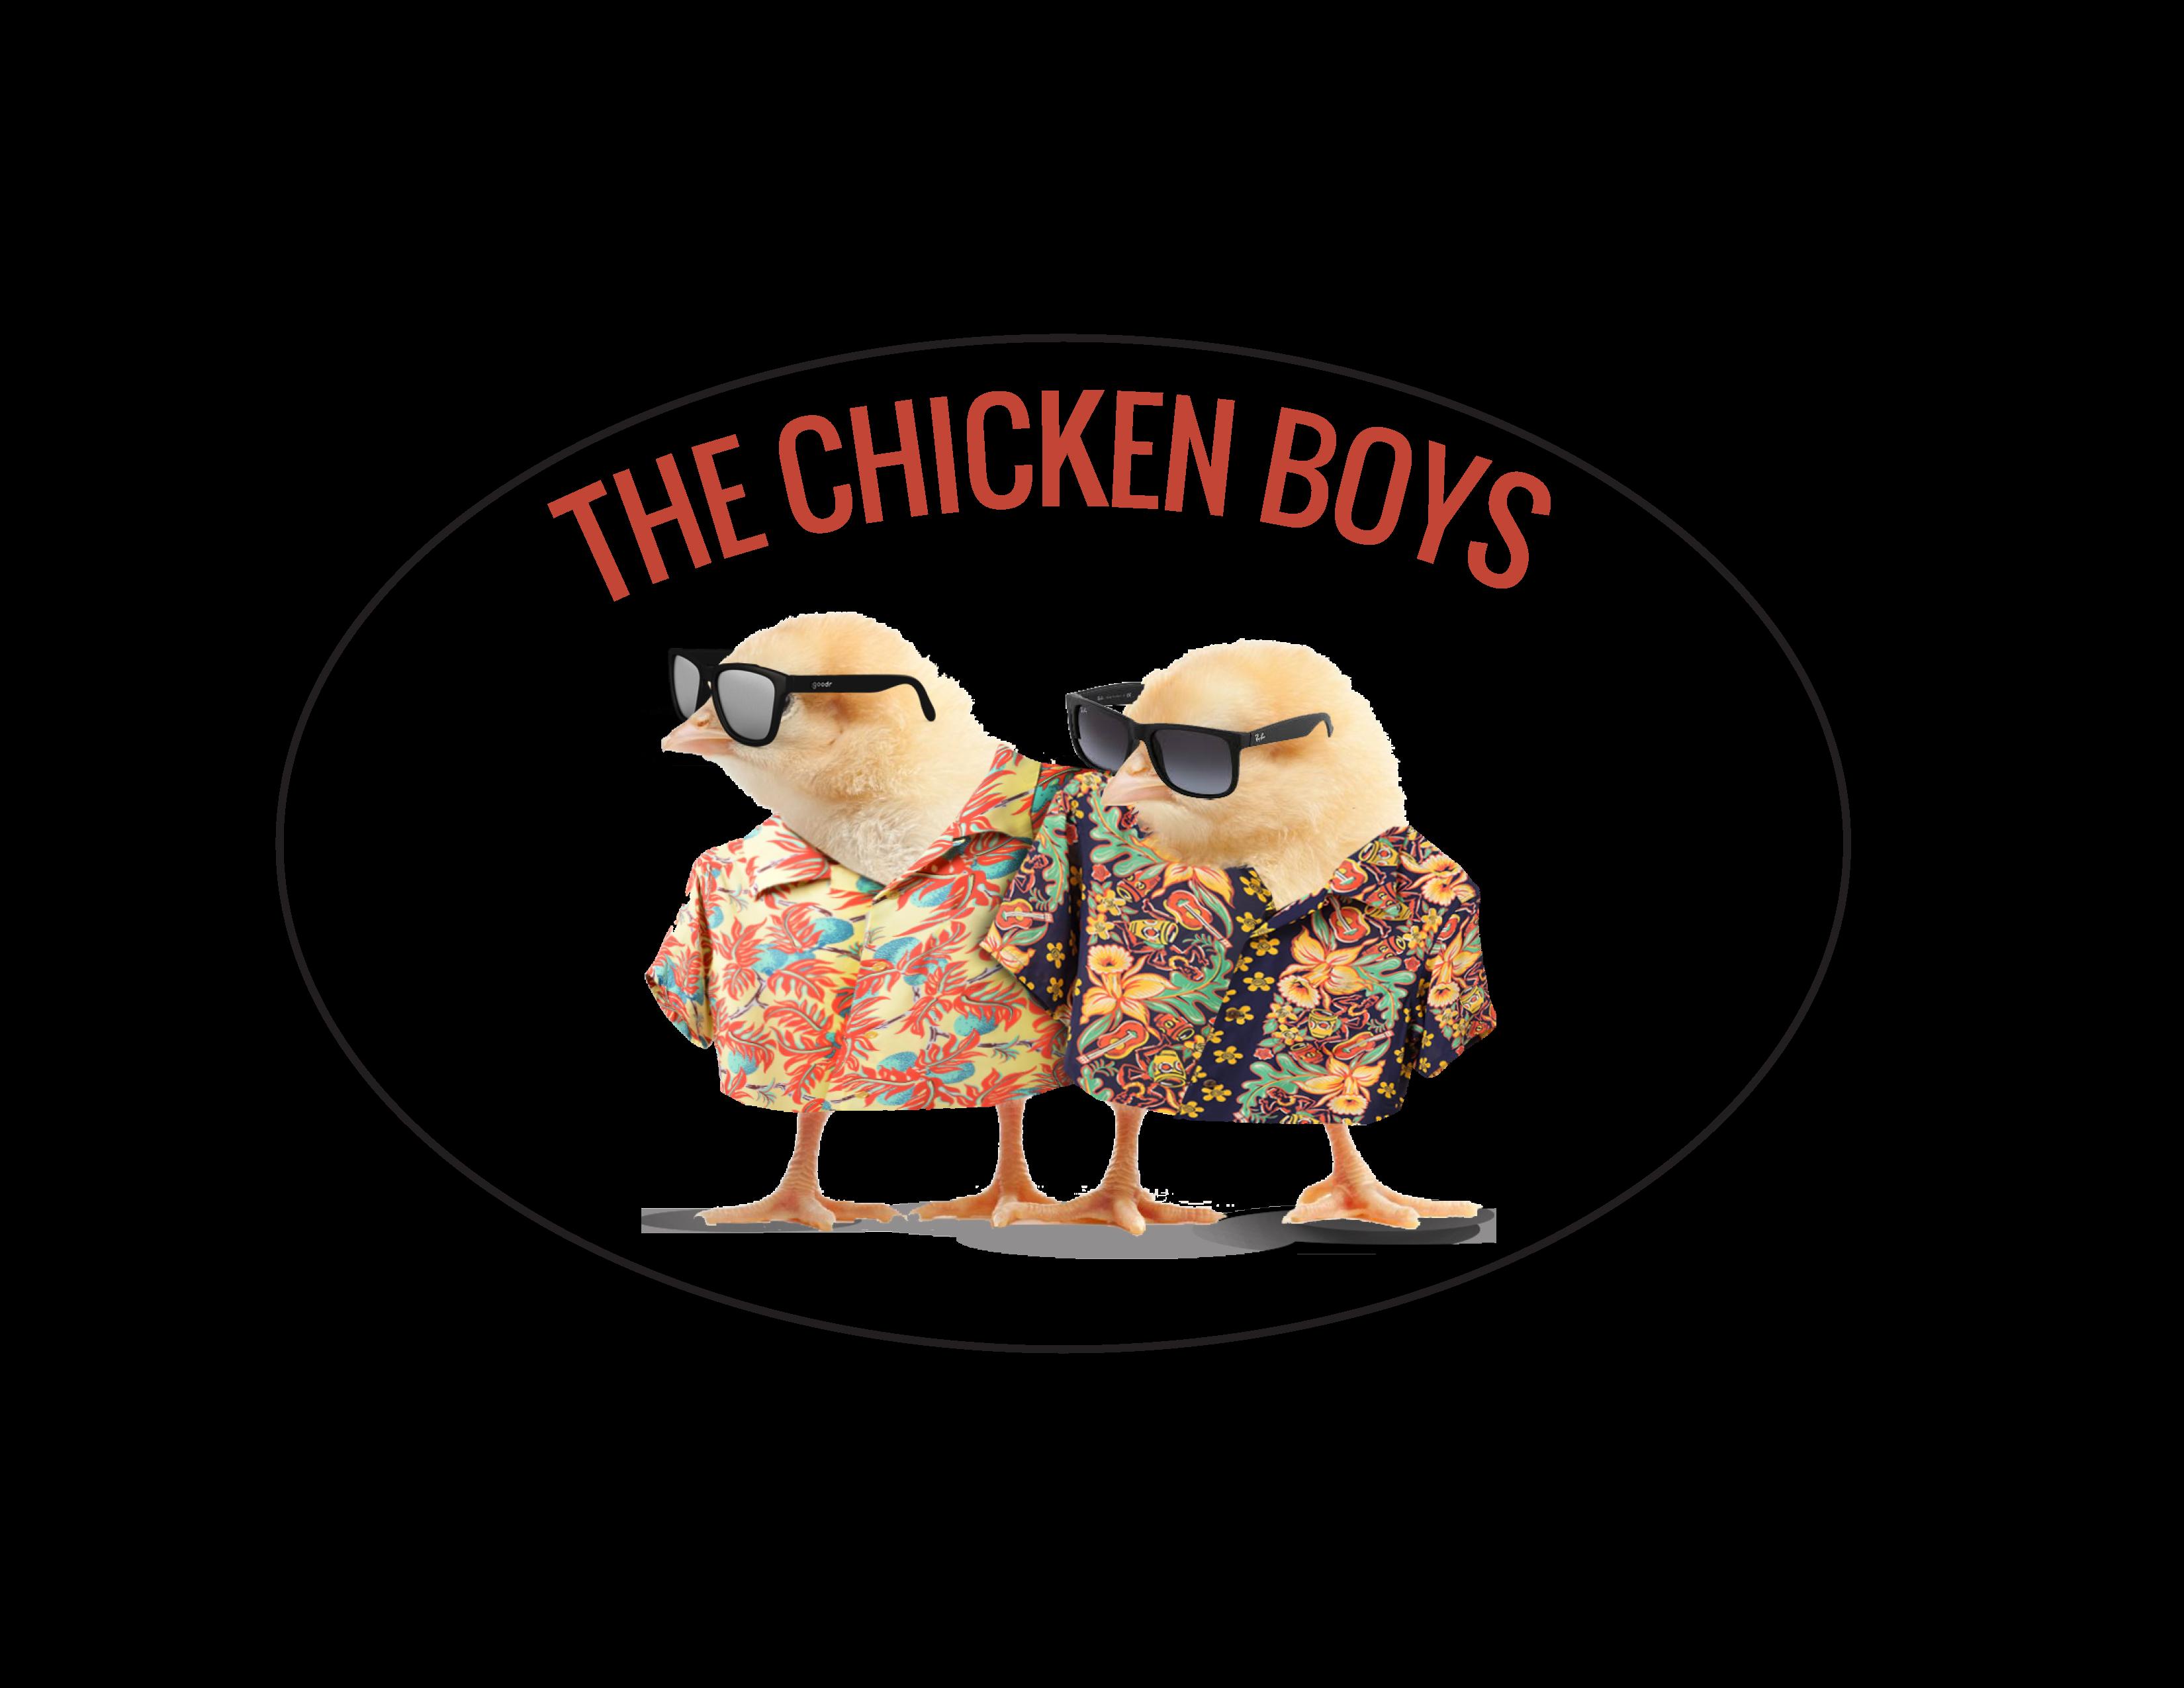 The Chicken Boys